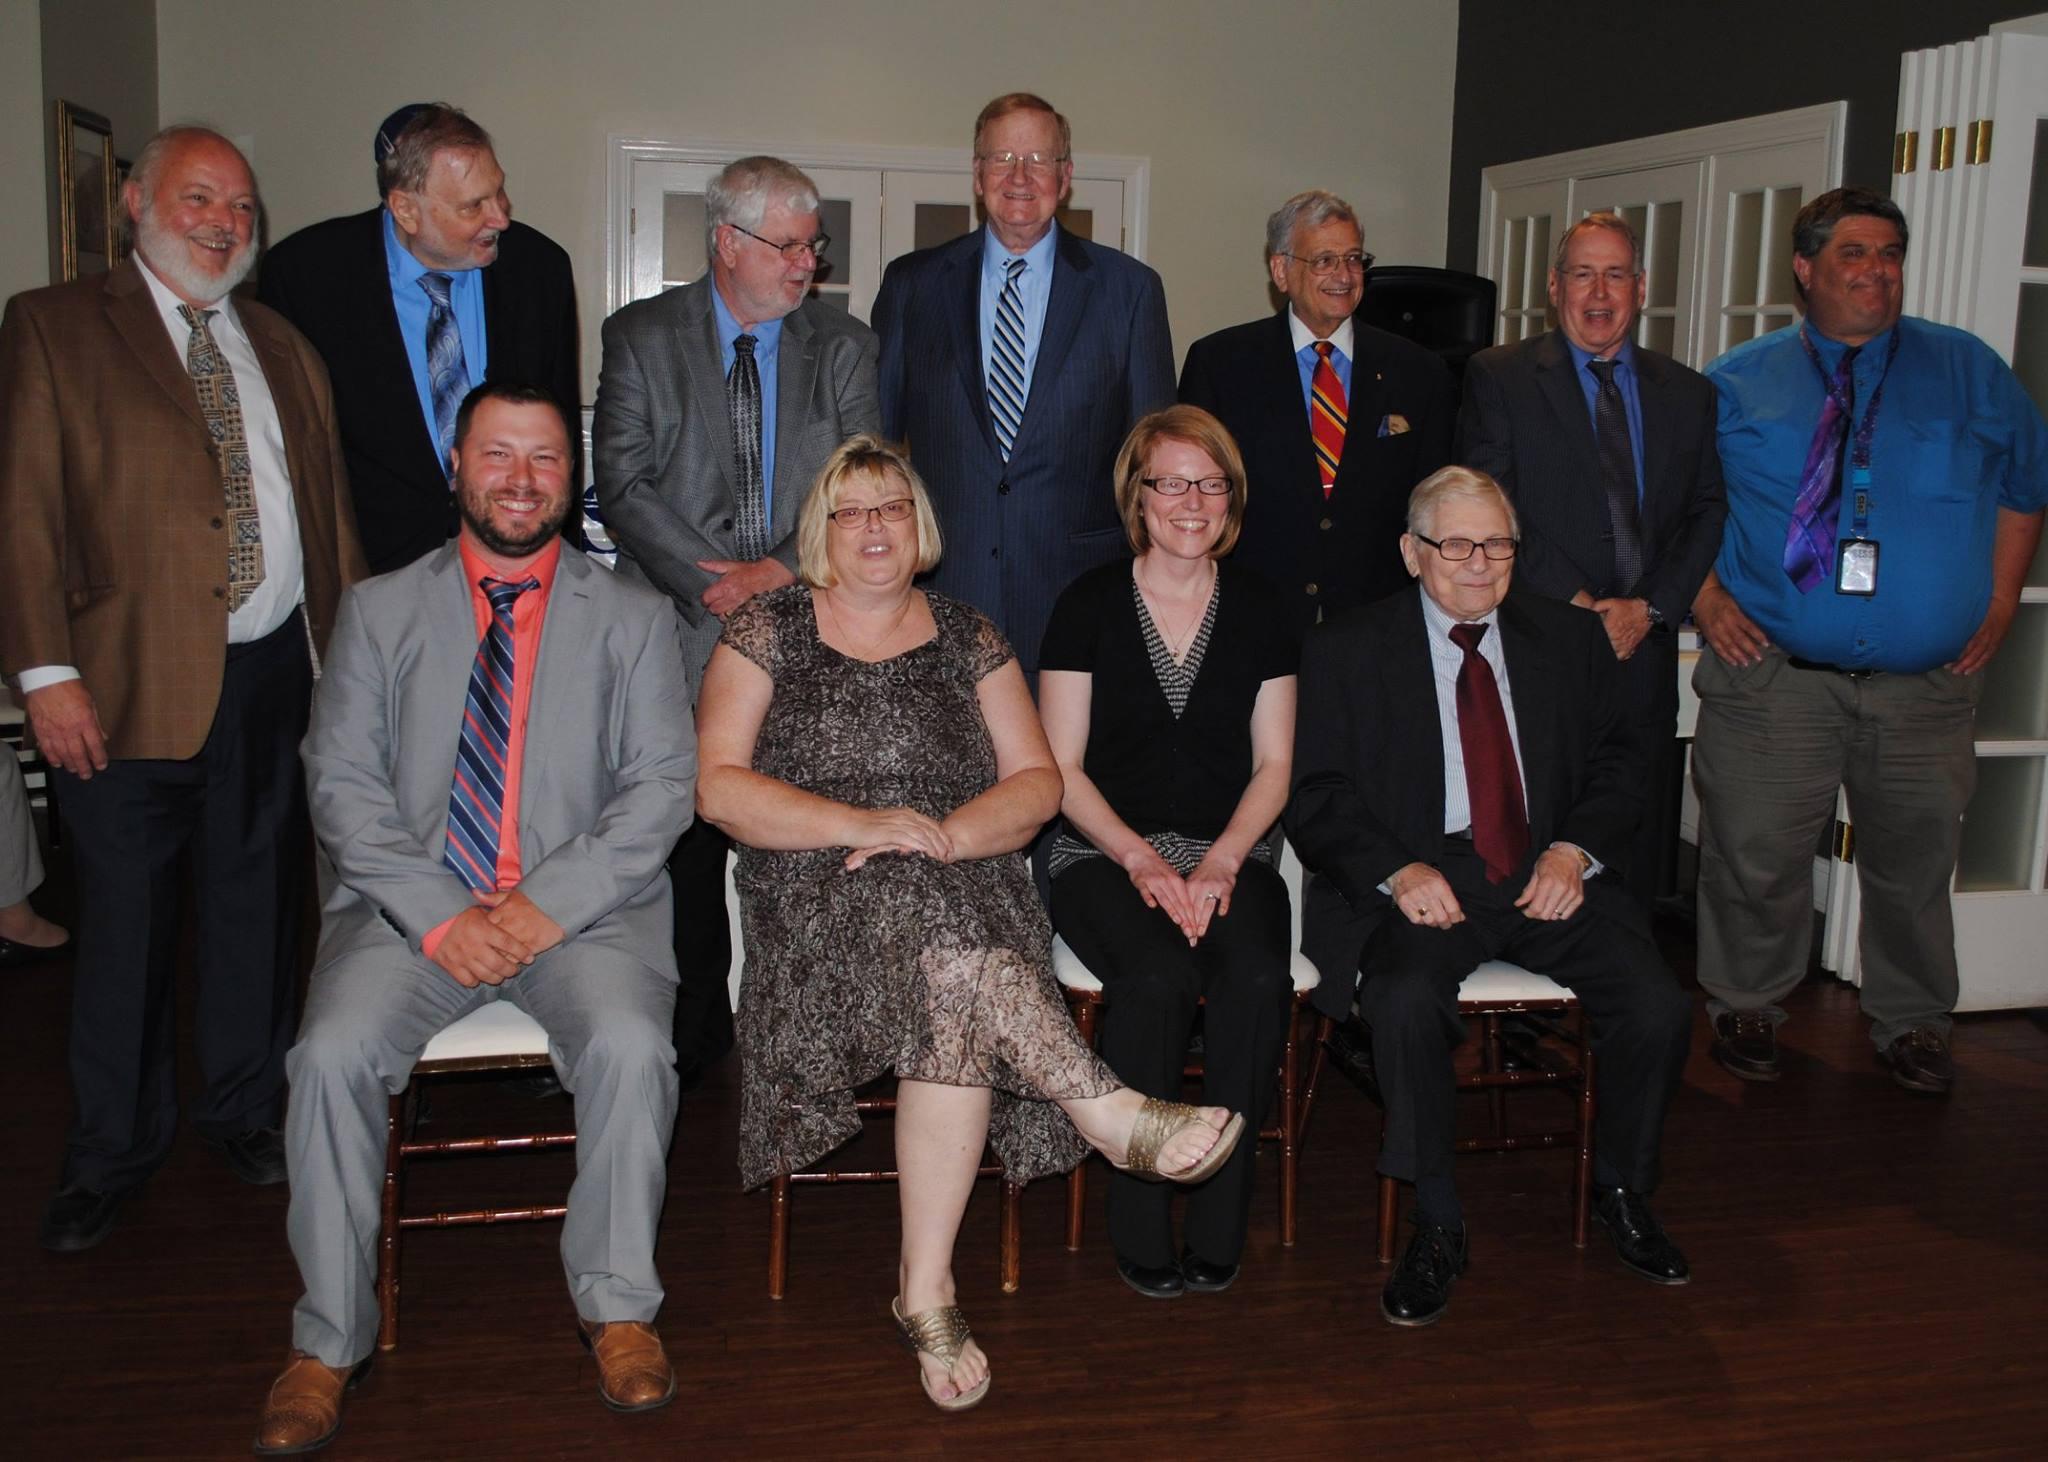 SCSU Journalism students, faculty represented at CTSPJ Awards Dinner